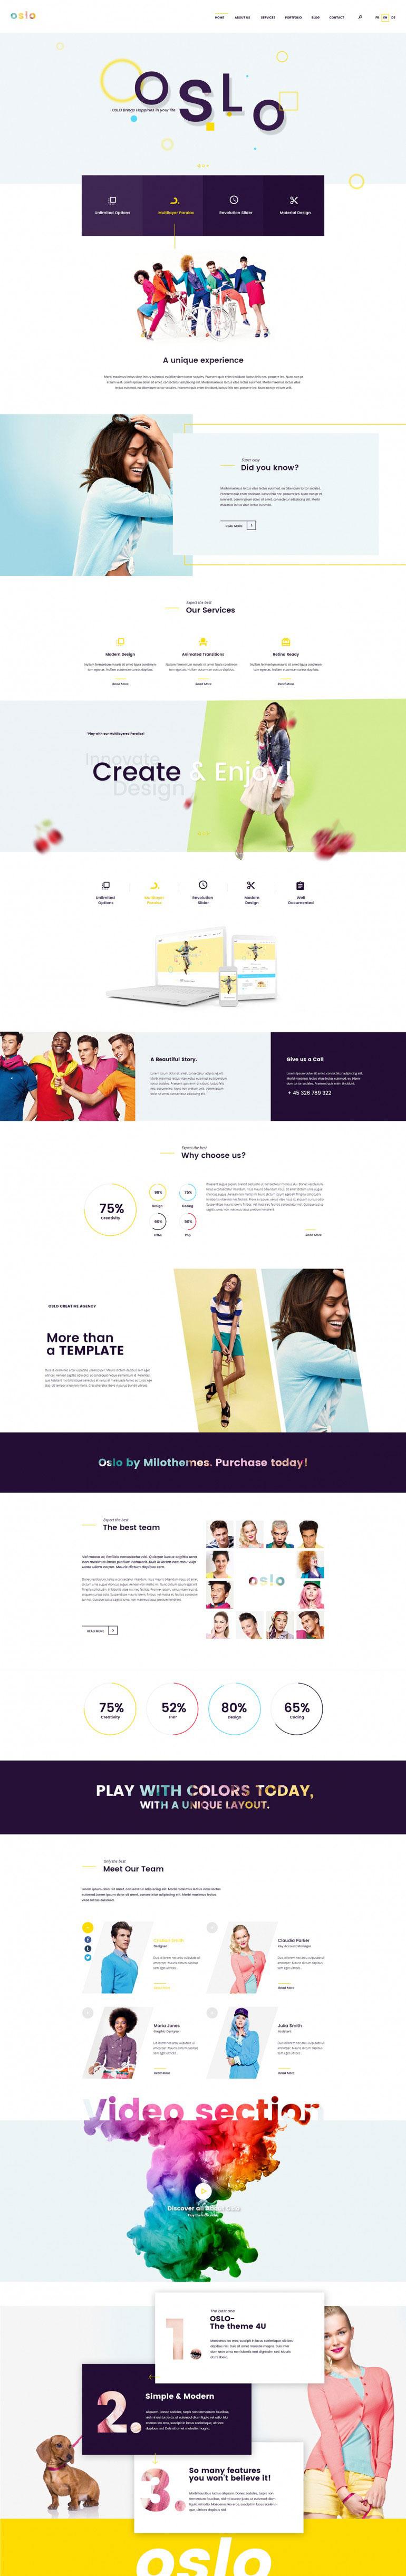 Creative_Website_Design_Inspiration_2016_018